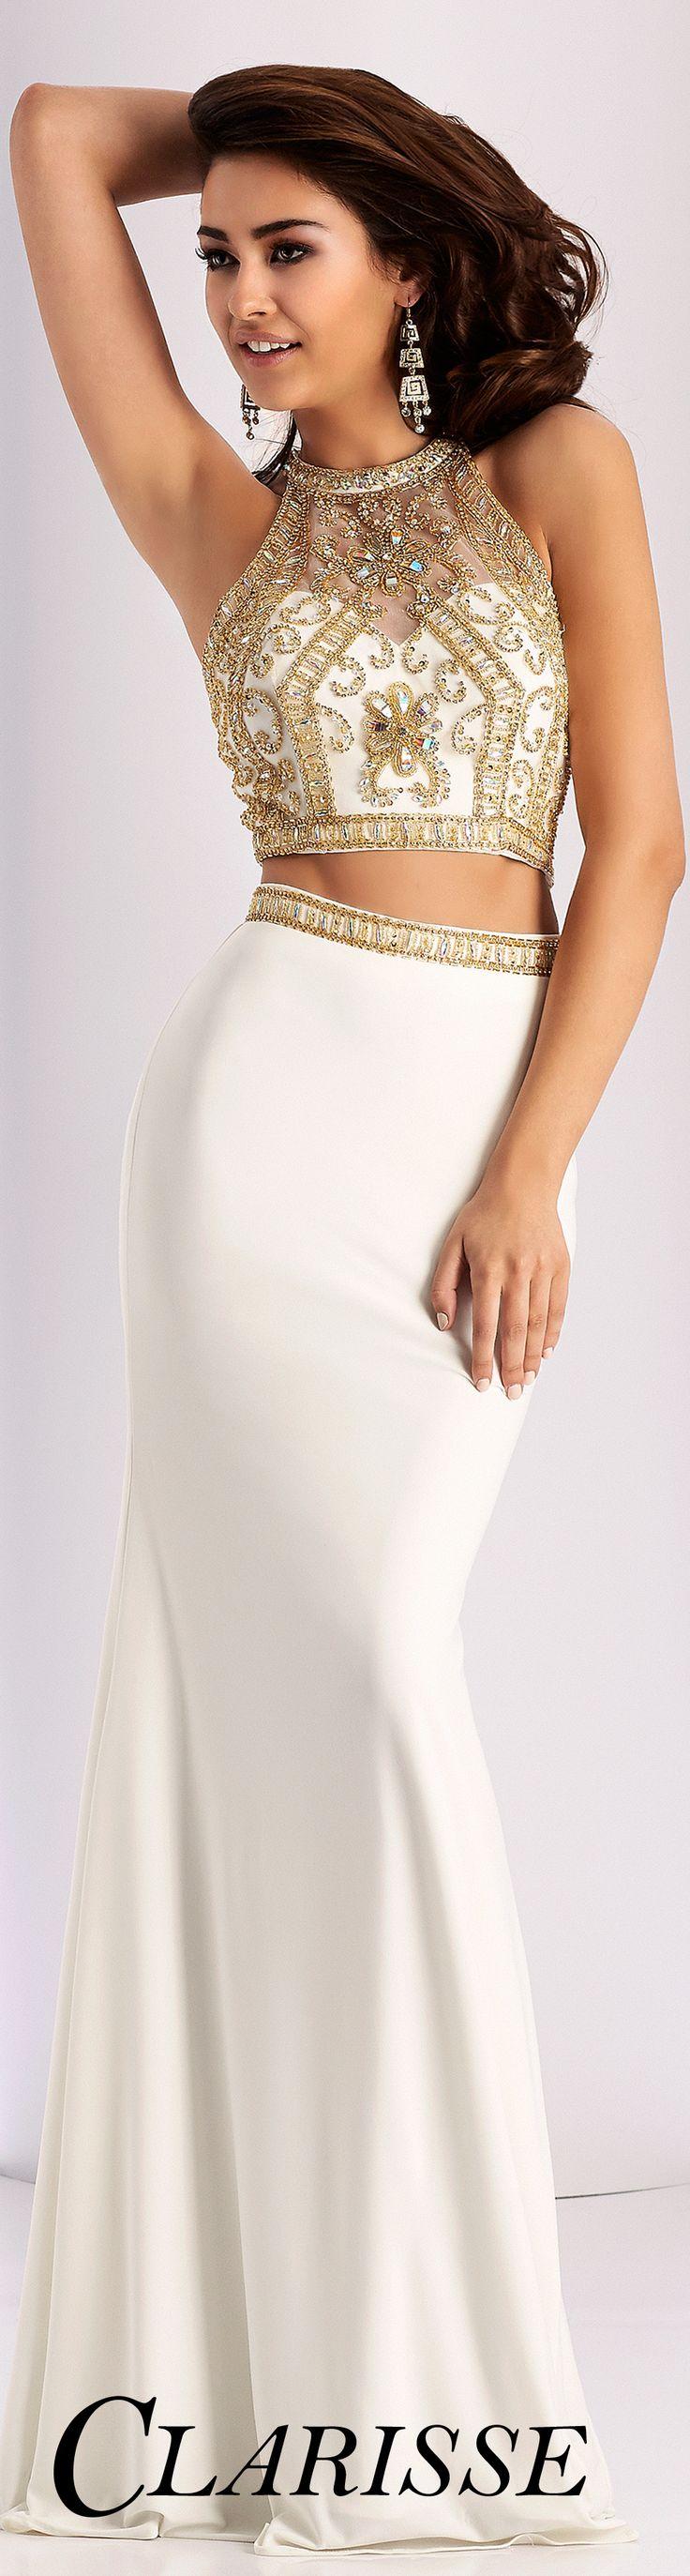 Best 25+ Fitted prom dresses ideas on Pinterest | Mermaid ...